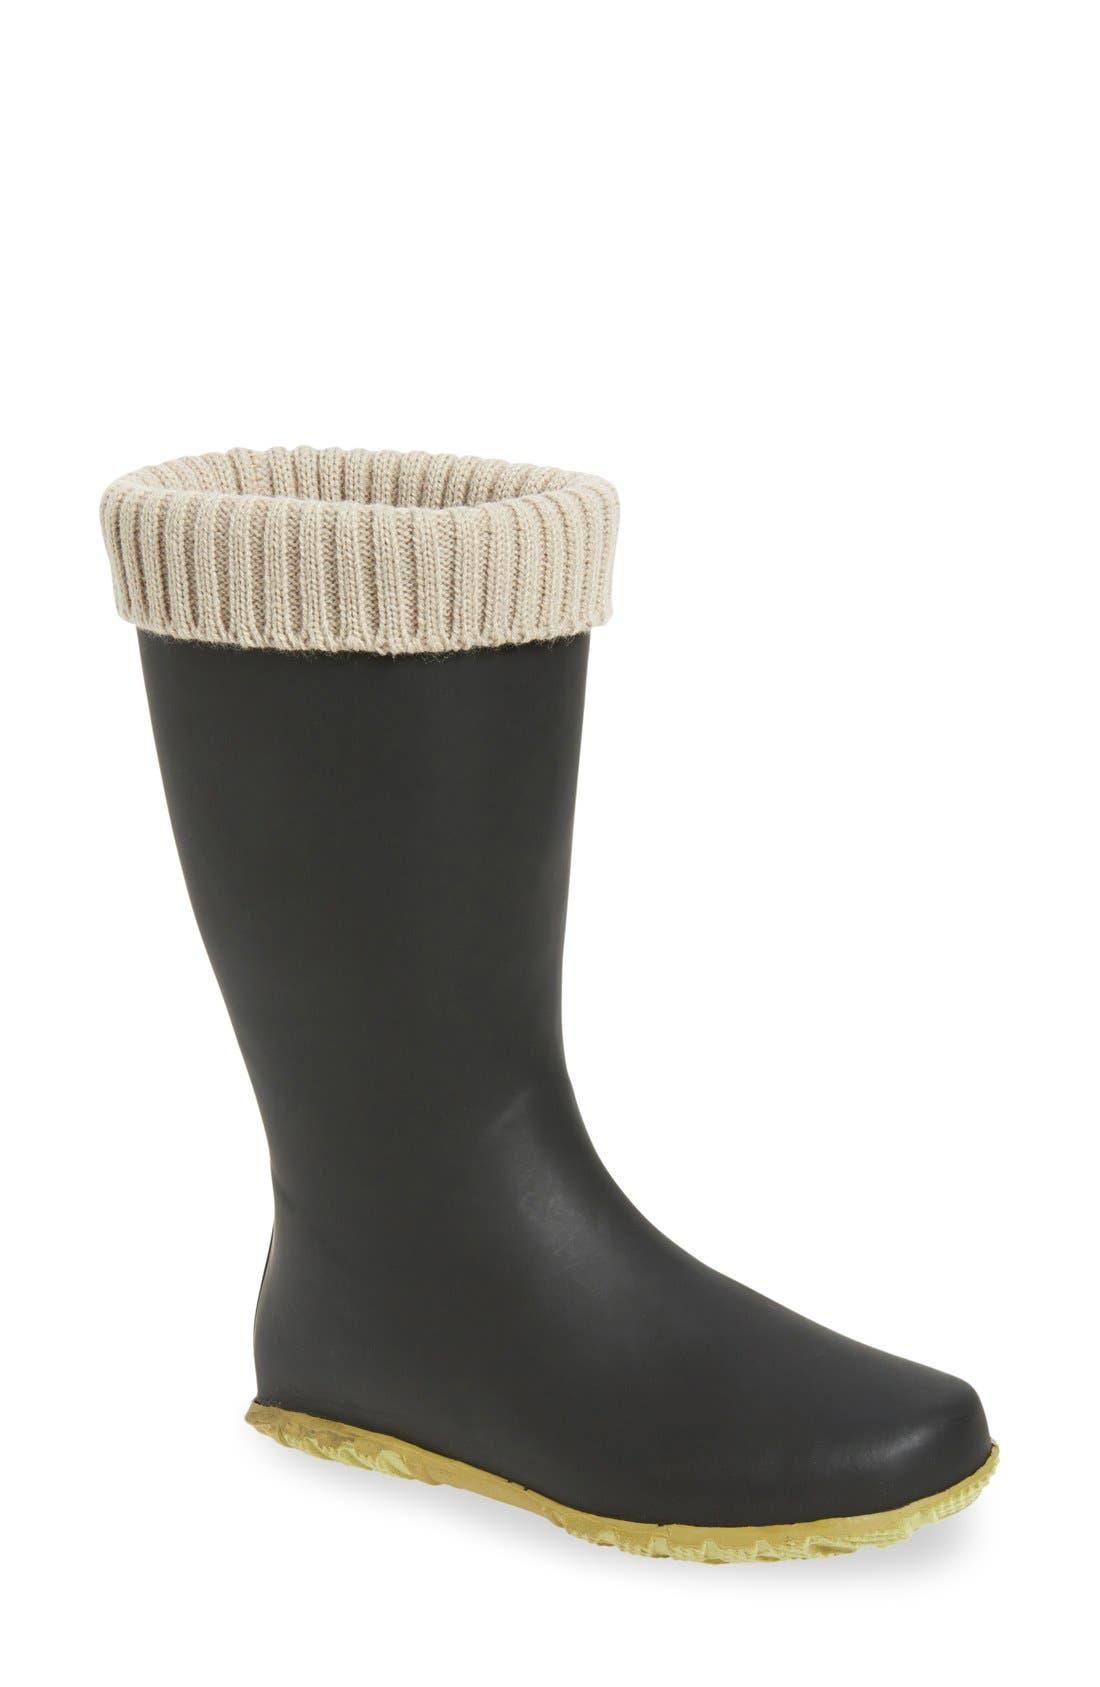 Weatherproof Rain Boot,                             Main thumbnail 1, color,                             001